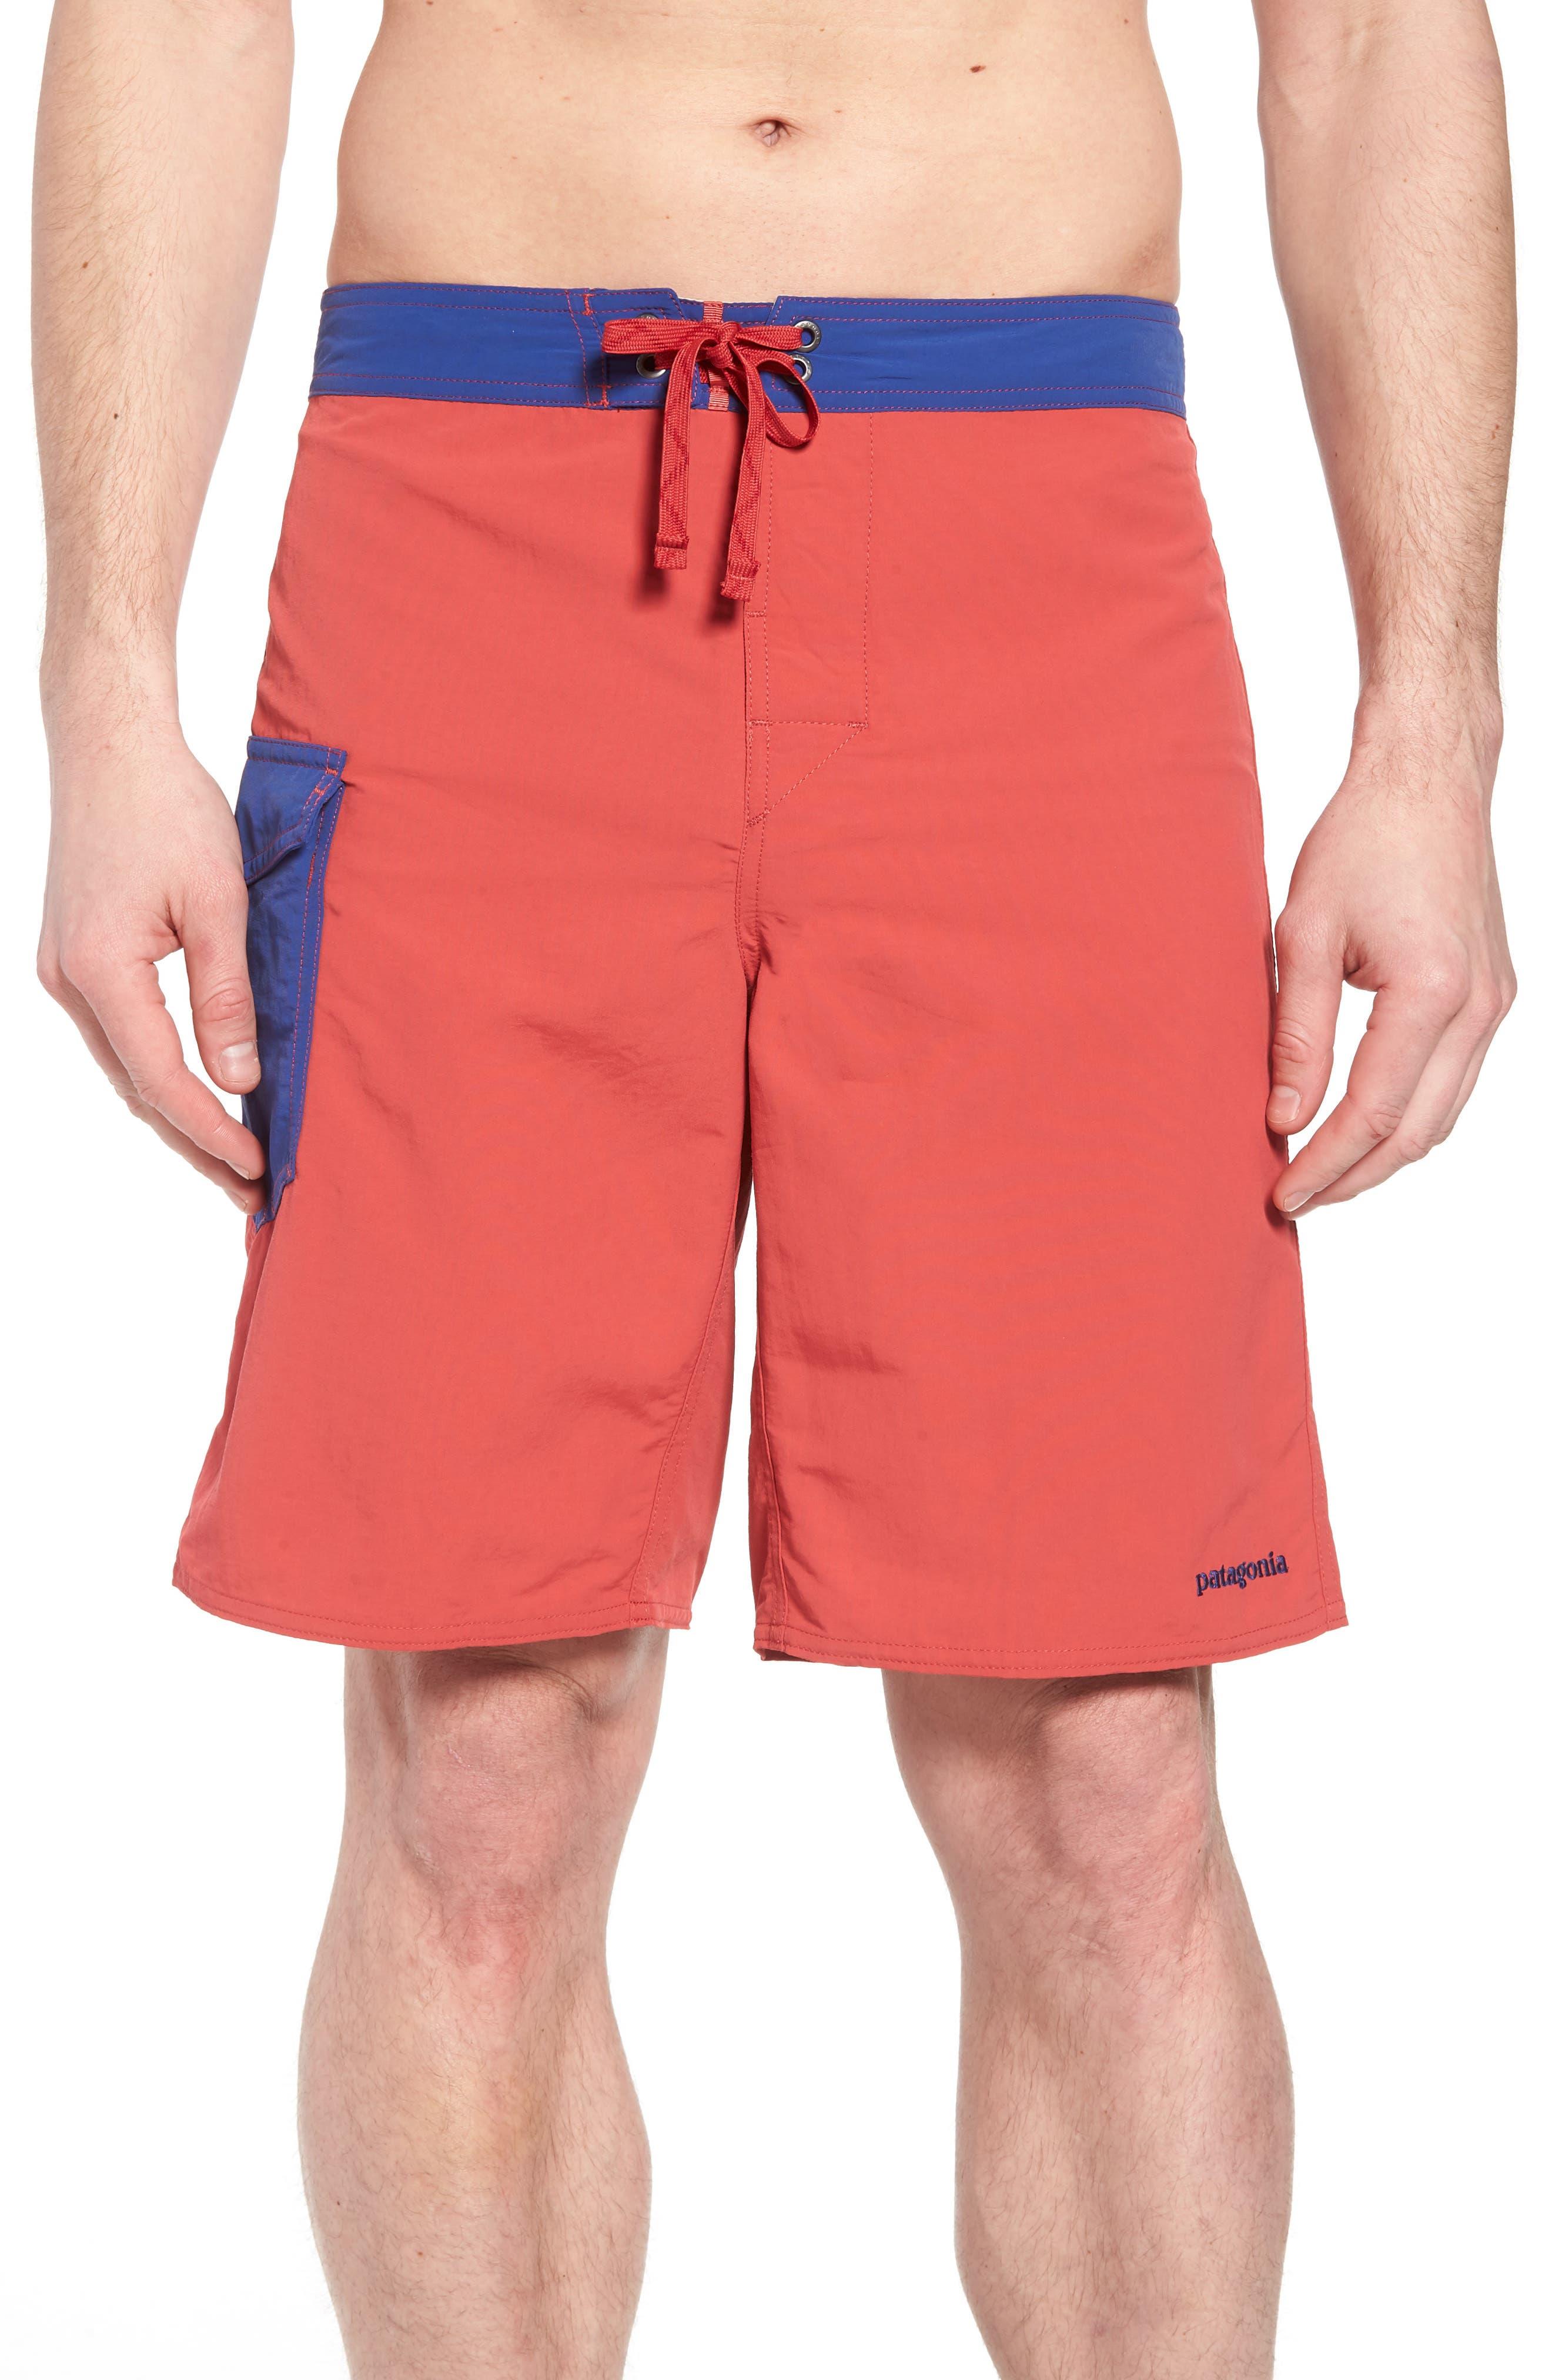 Patagonia Wavefarer Board Shorts, Red